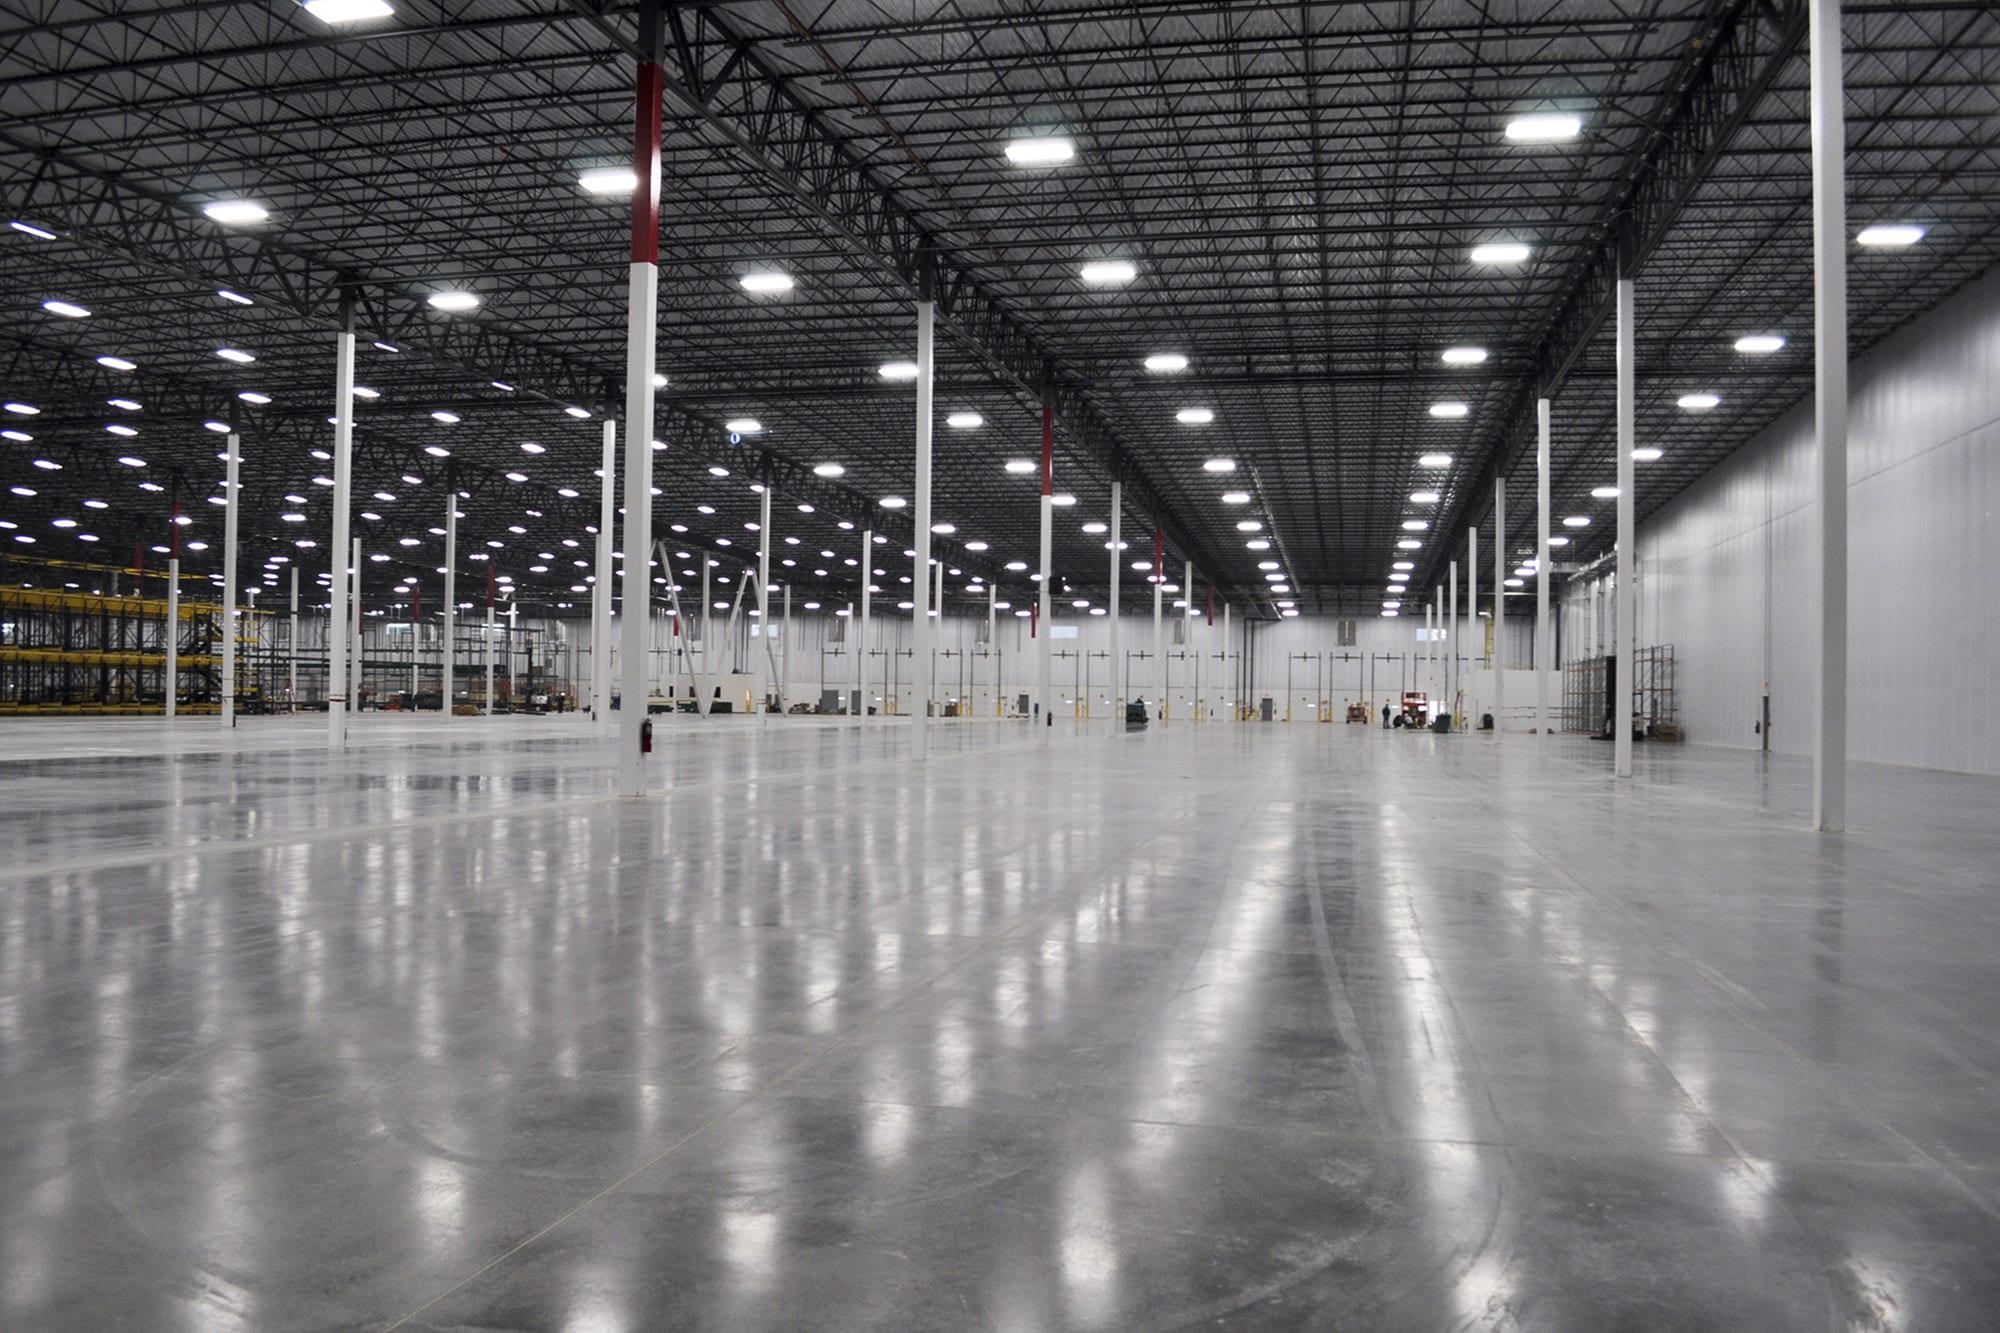 Ollie S Bargain Outlet Distribution Center Kinsley Construction